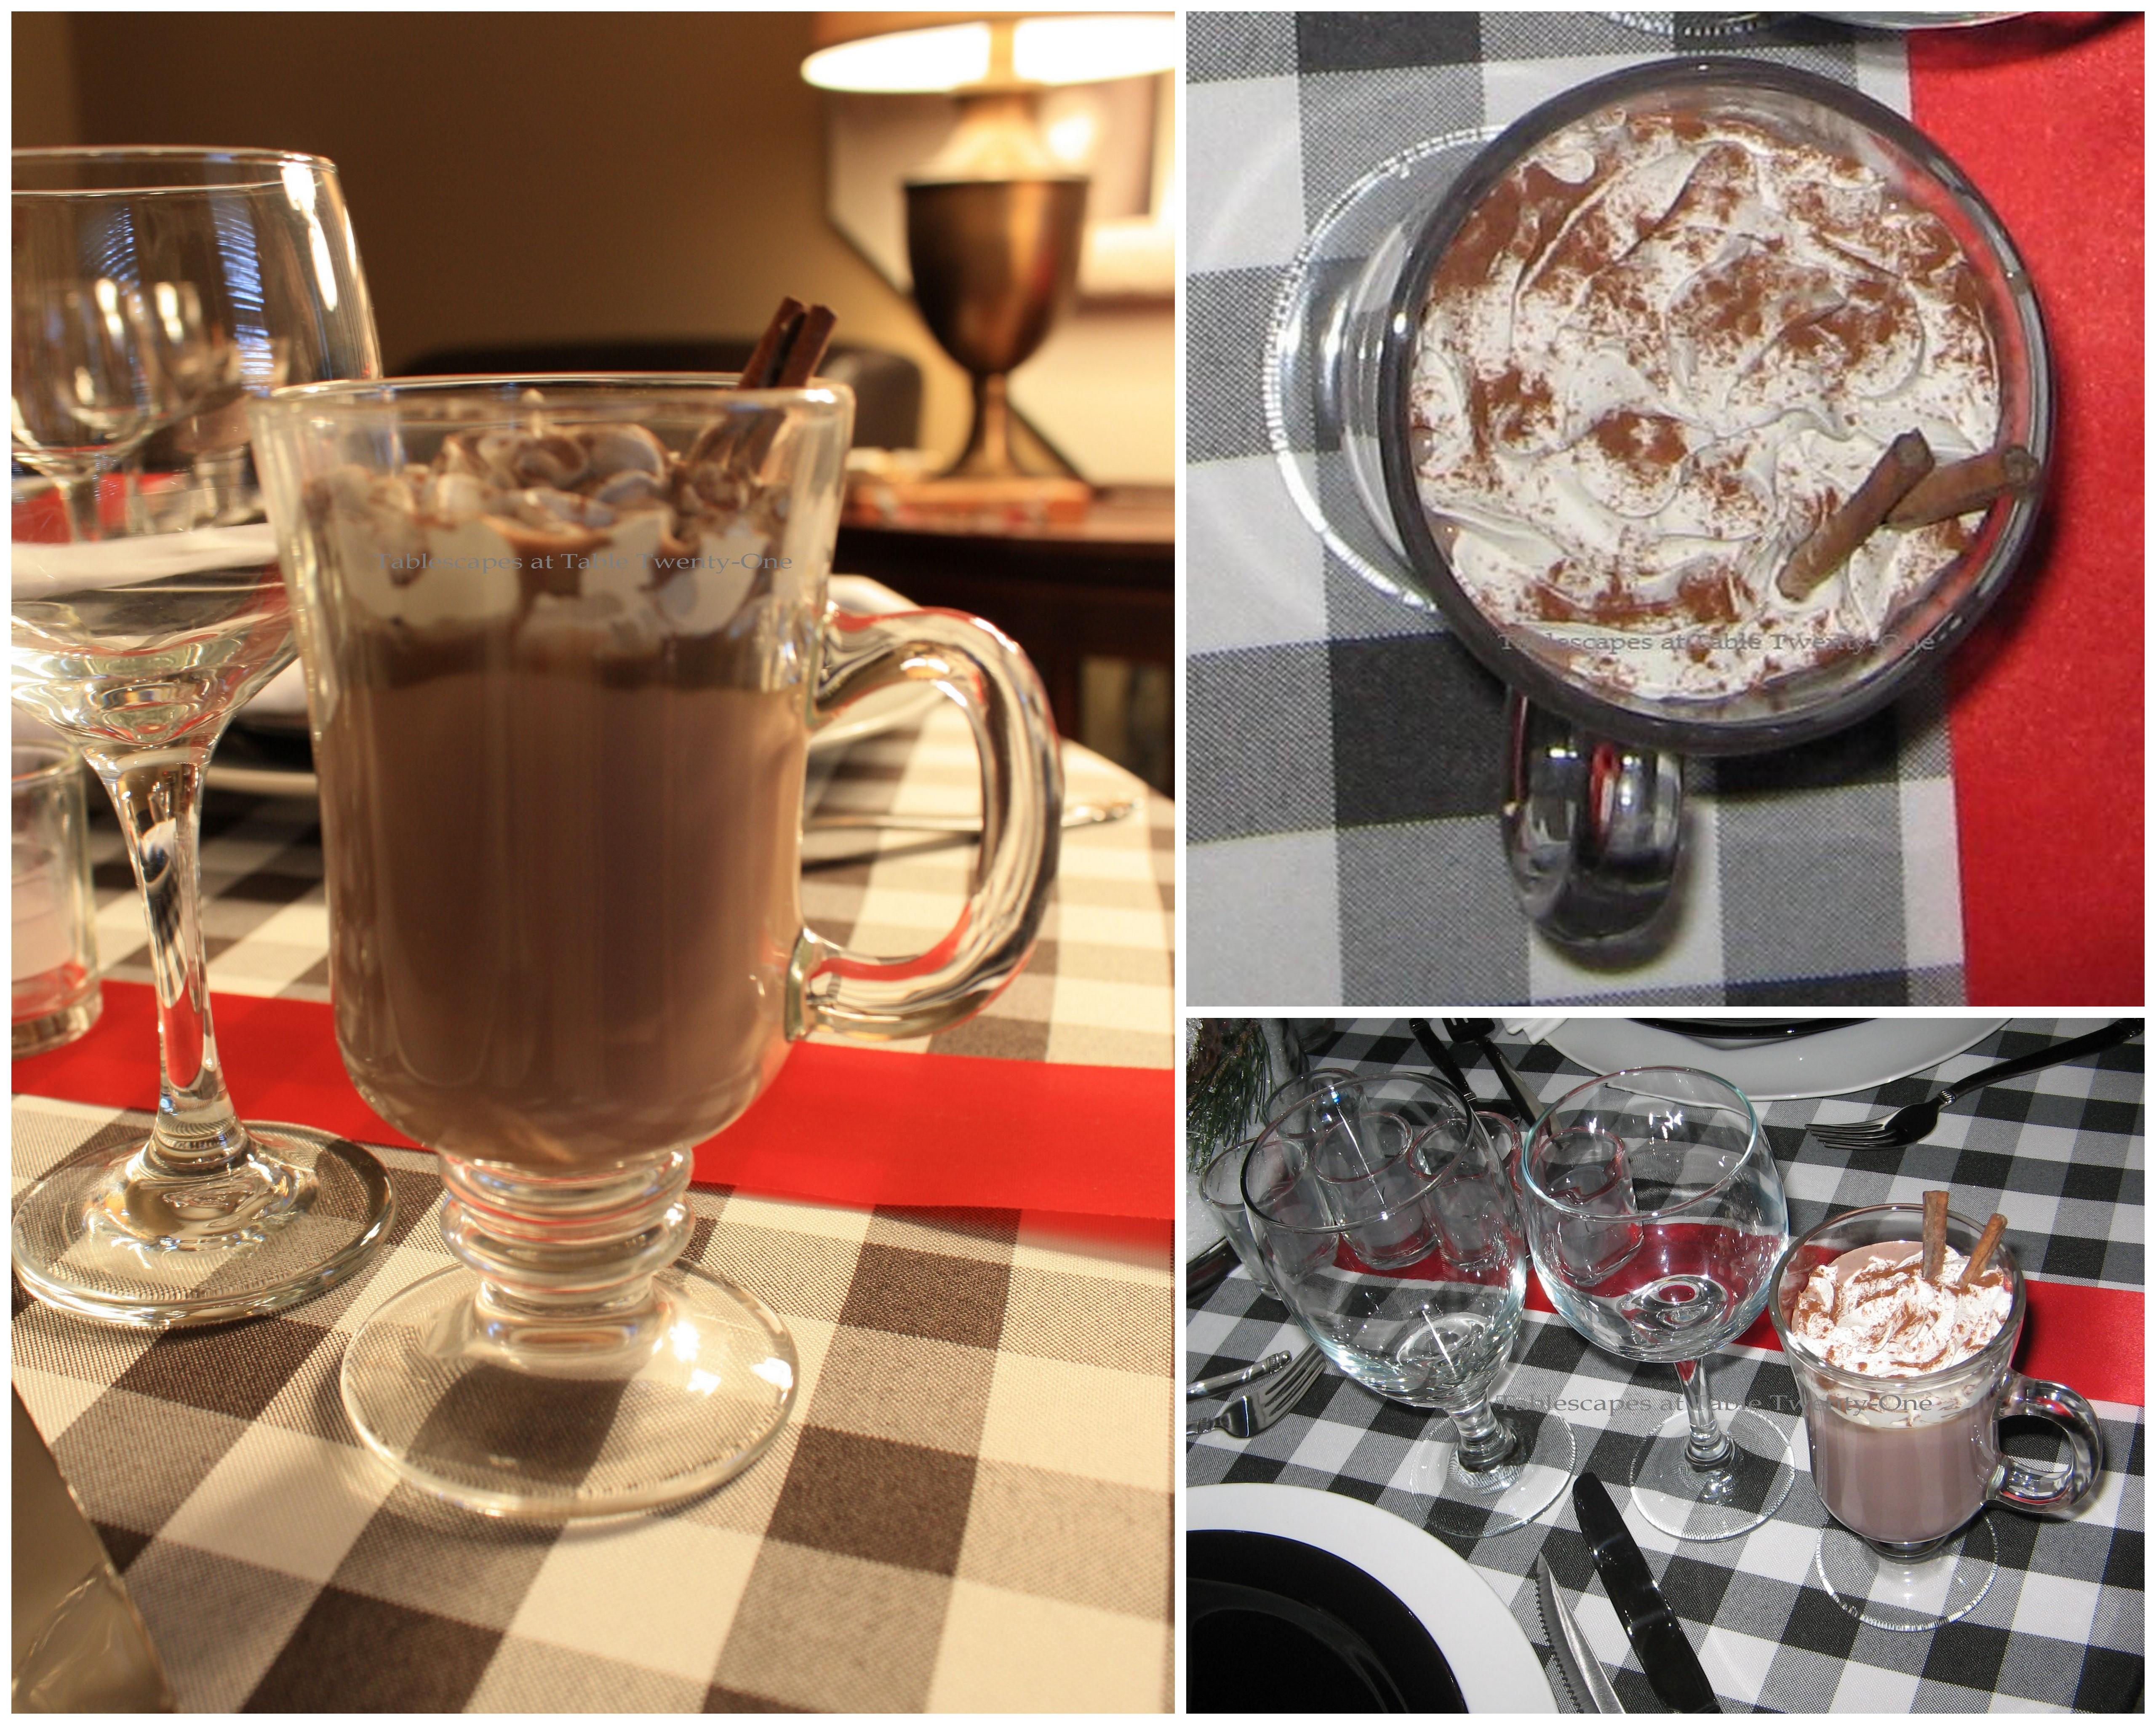 Hot chocolate & stemware collage